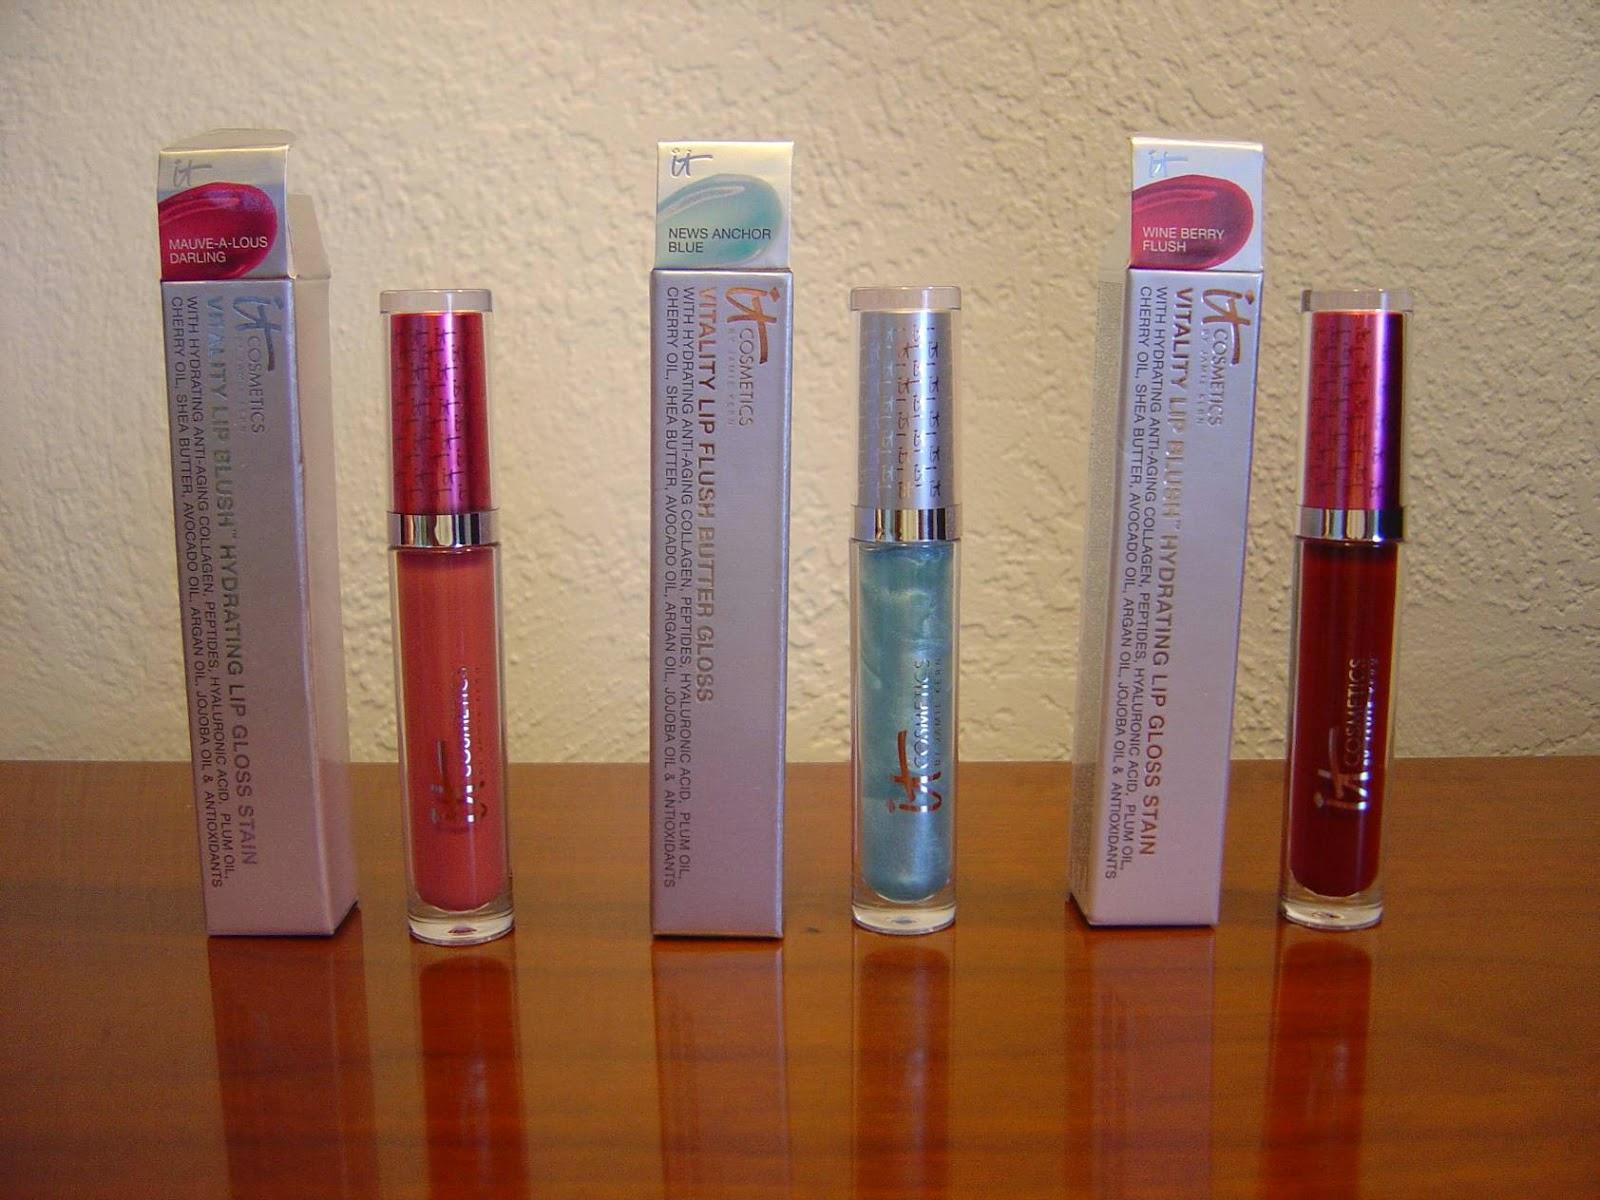 IT Cosmetics Vitality Lip Blush Hydrating Lip Gloss Stains Trio.jpeg